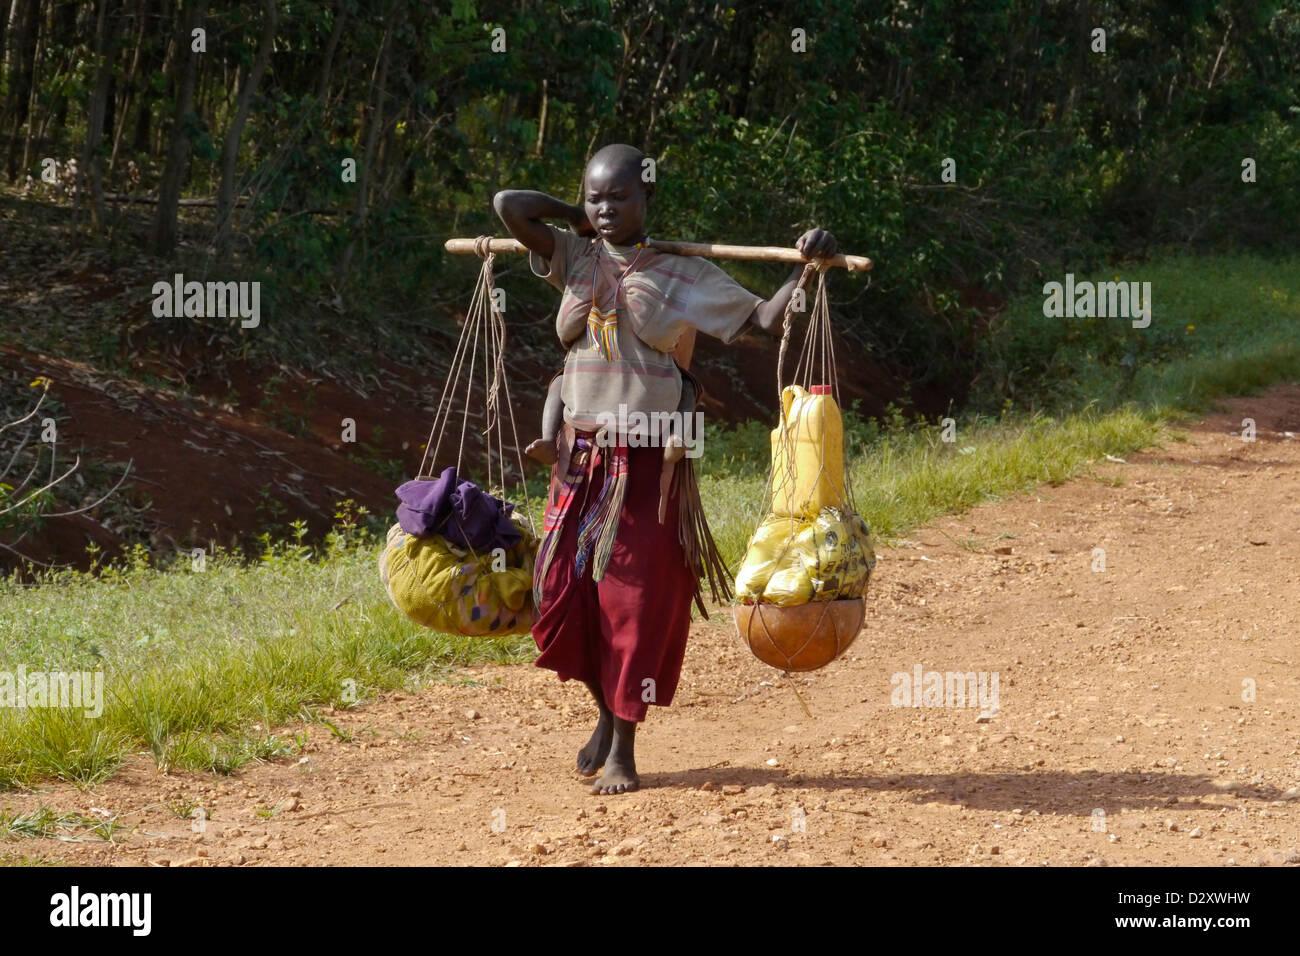 ethiopia road between chagni debate beni shangul gumuz region woman female carrying good or market transport Stock Photo